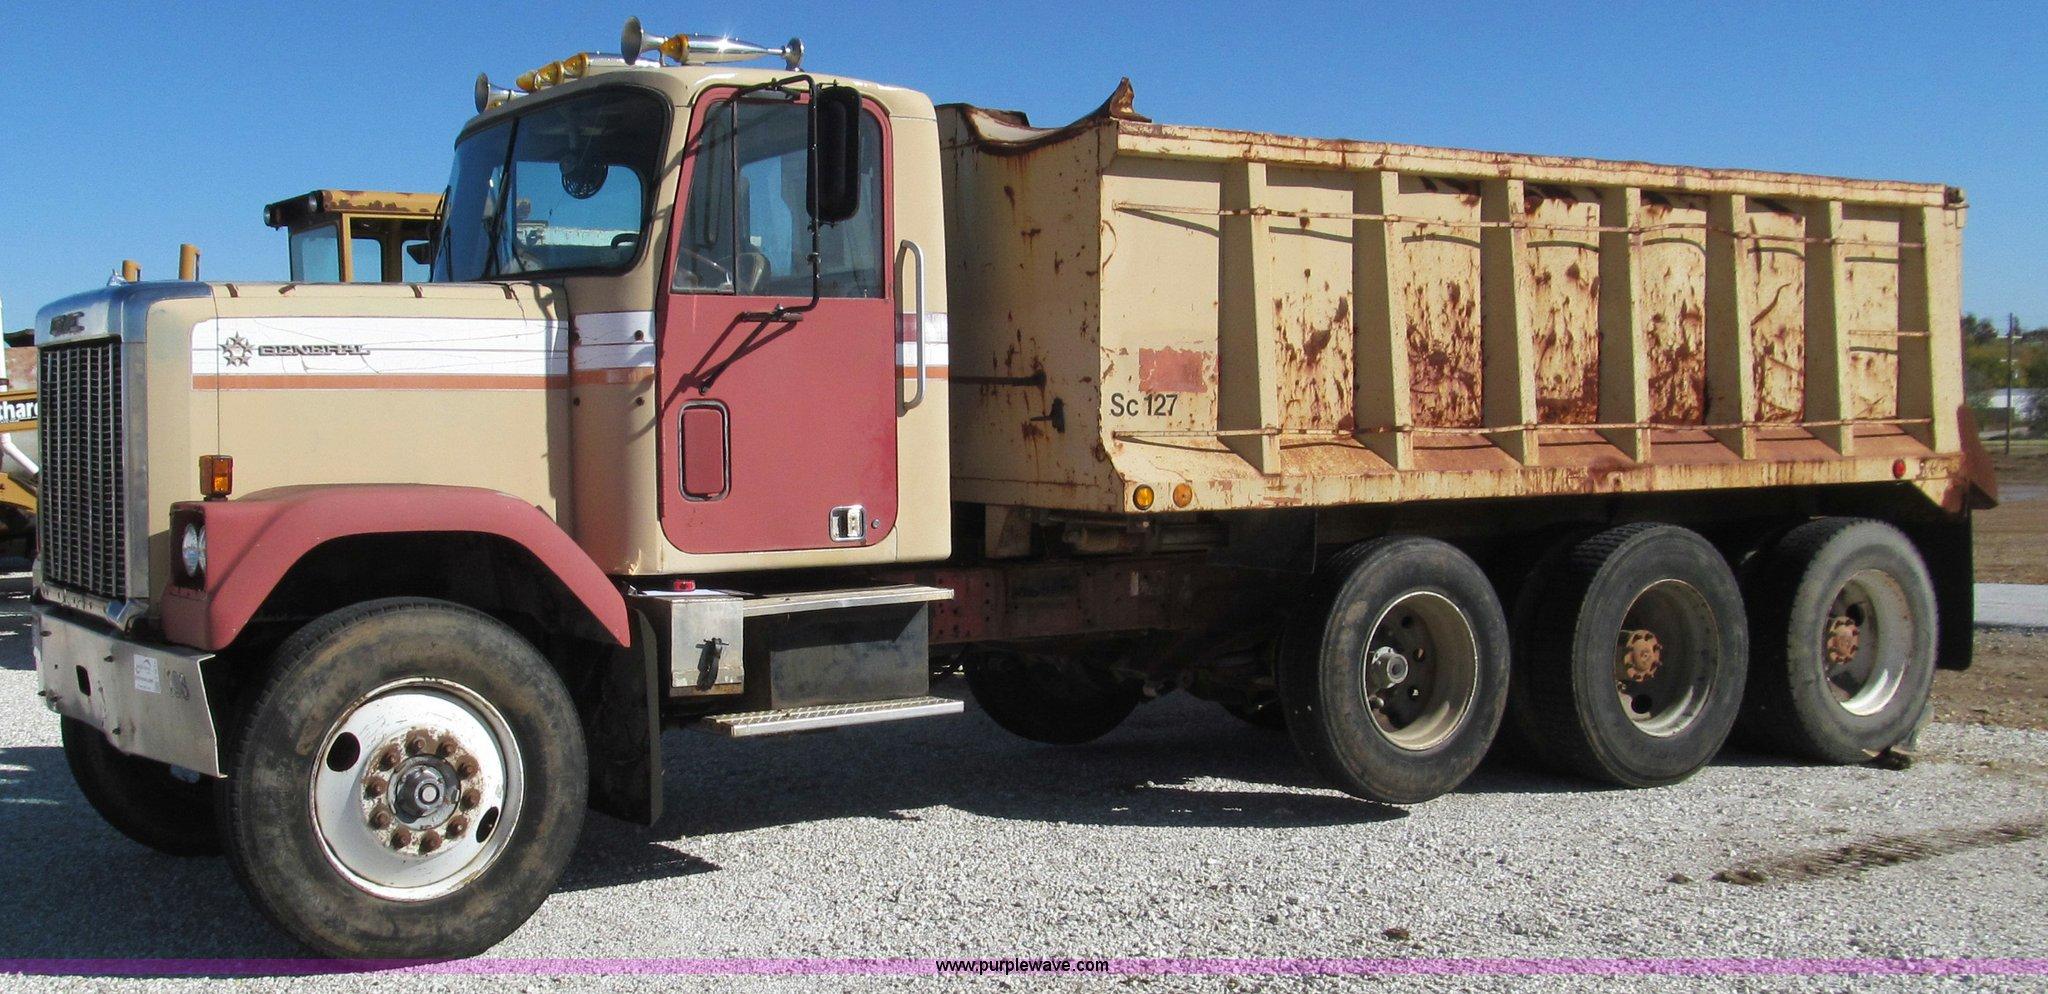 1978 Gmc General Dump Truck In Joplin Mo Item F4619 Sold Purple Wave